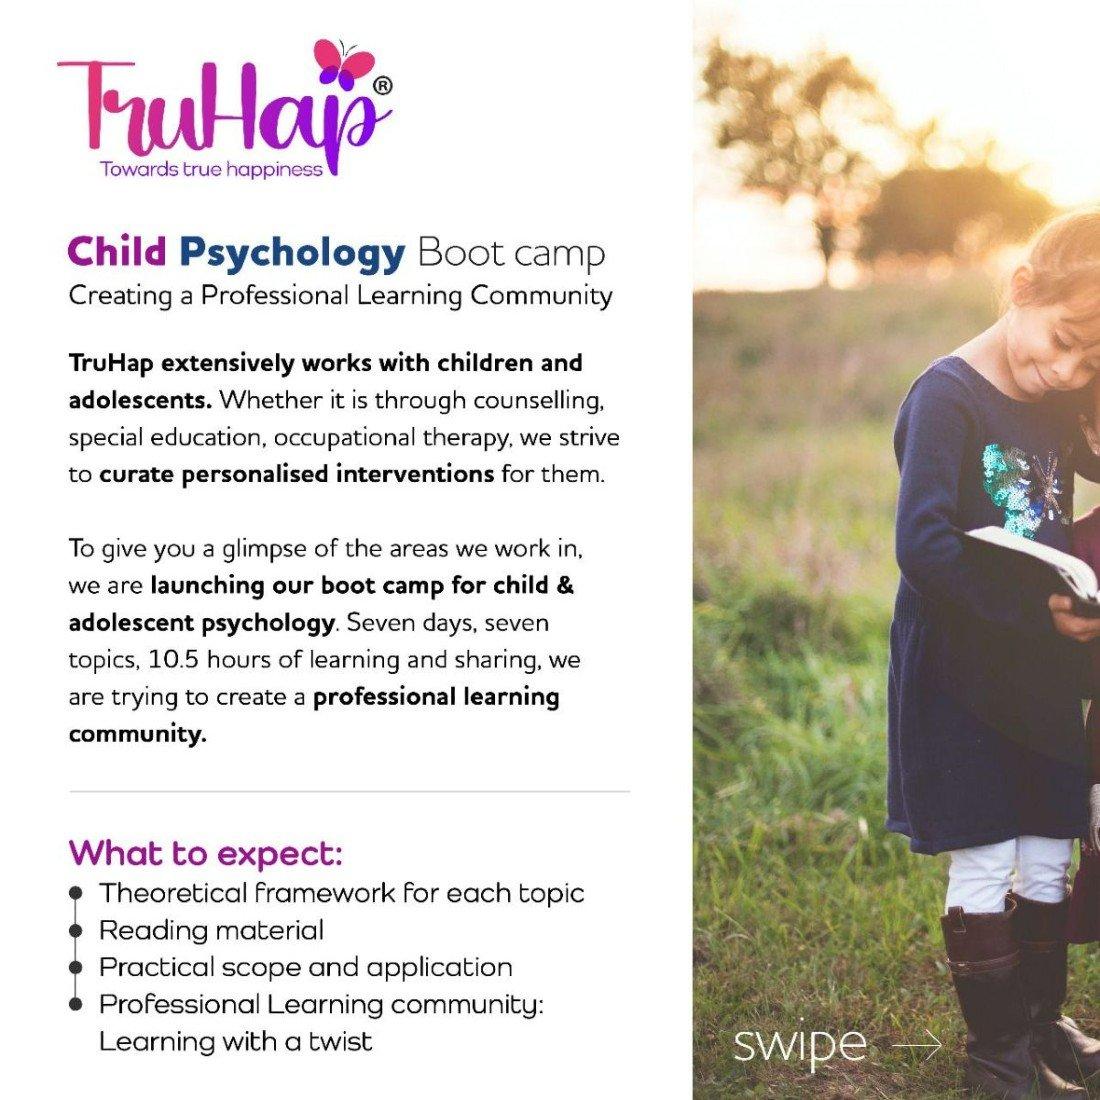 Child Psychology Boot Camp